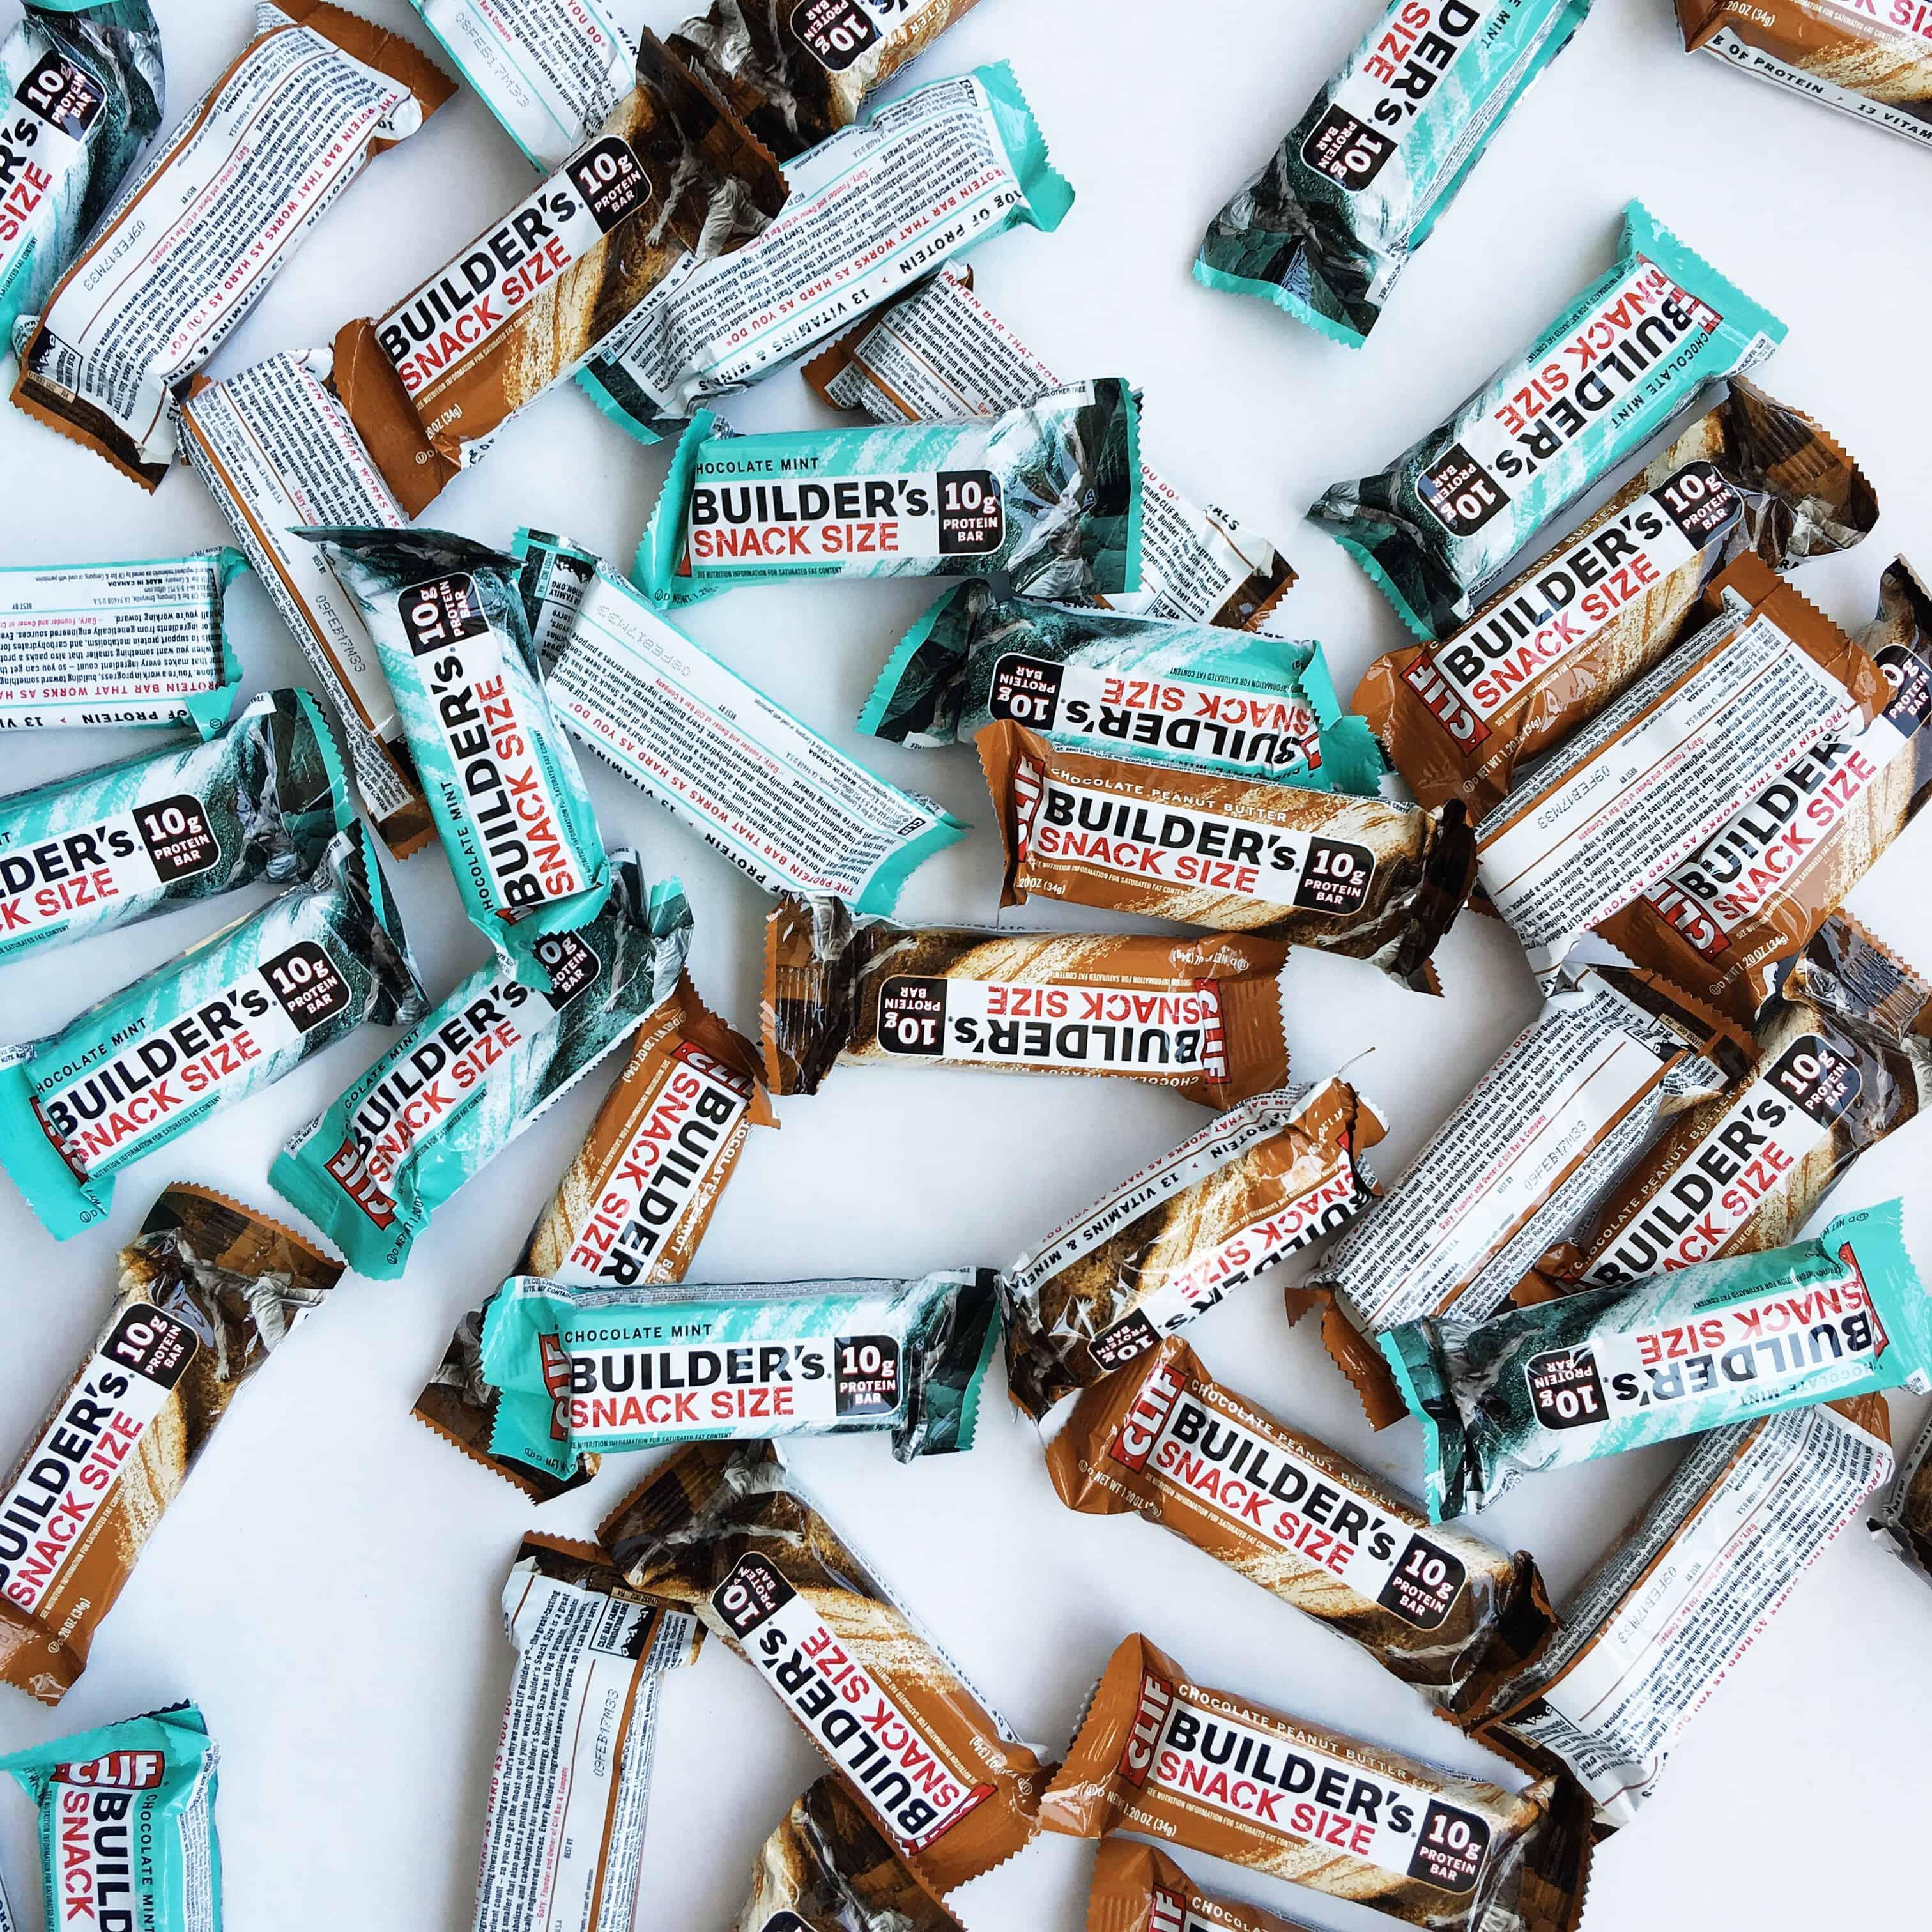 CLIF Snack Bars